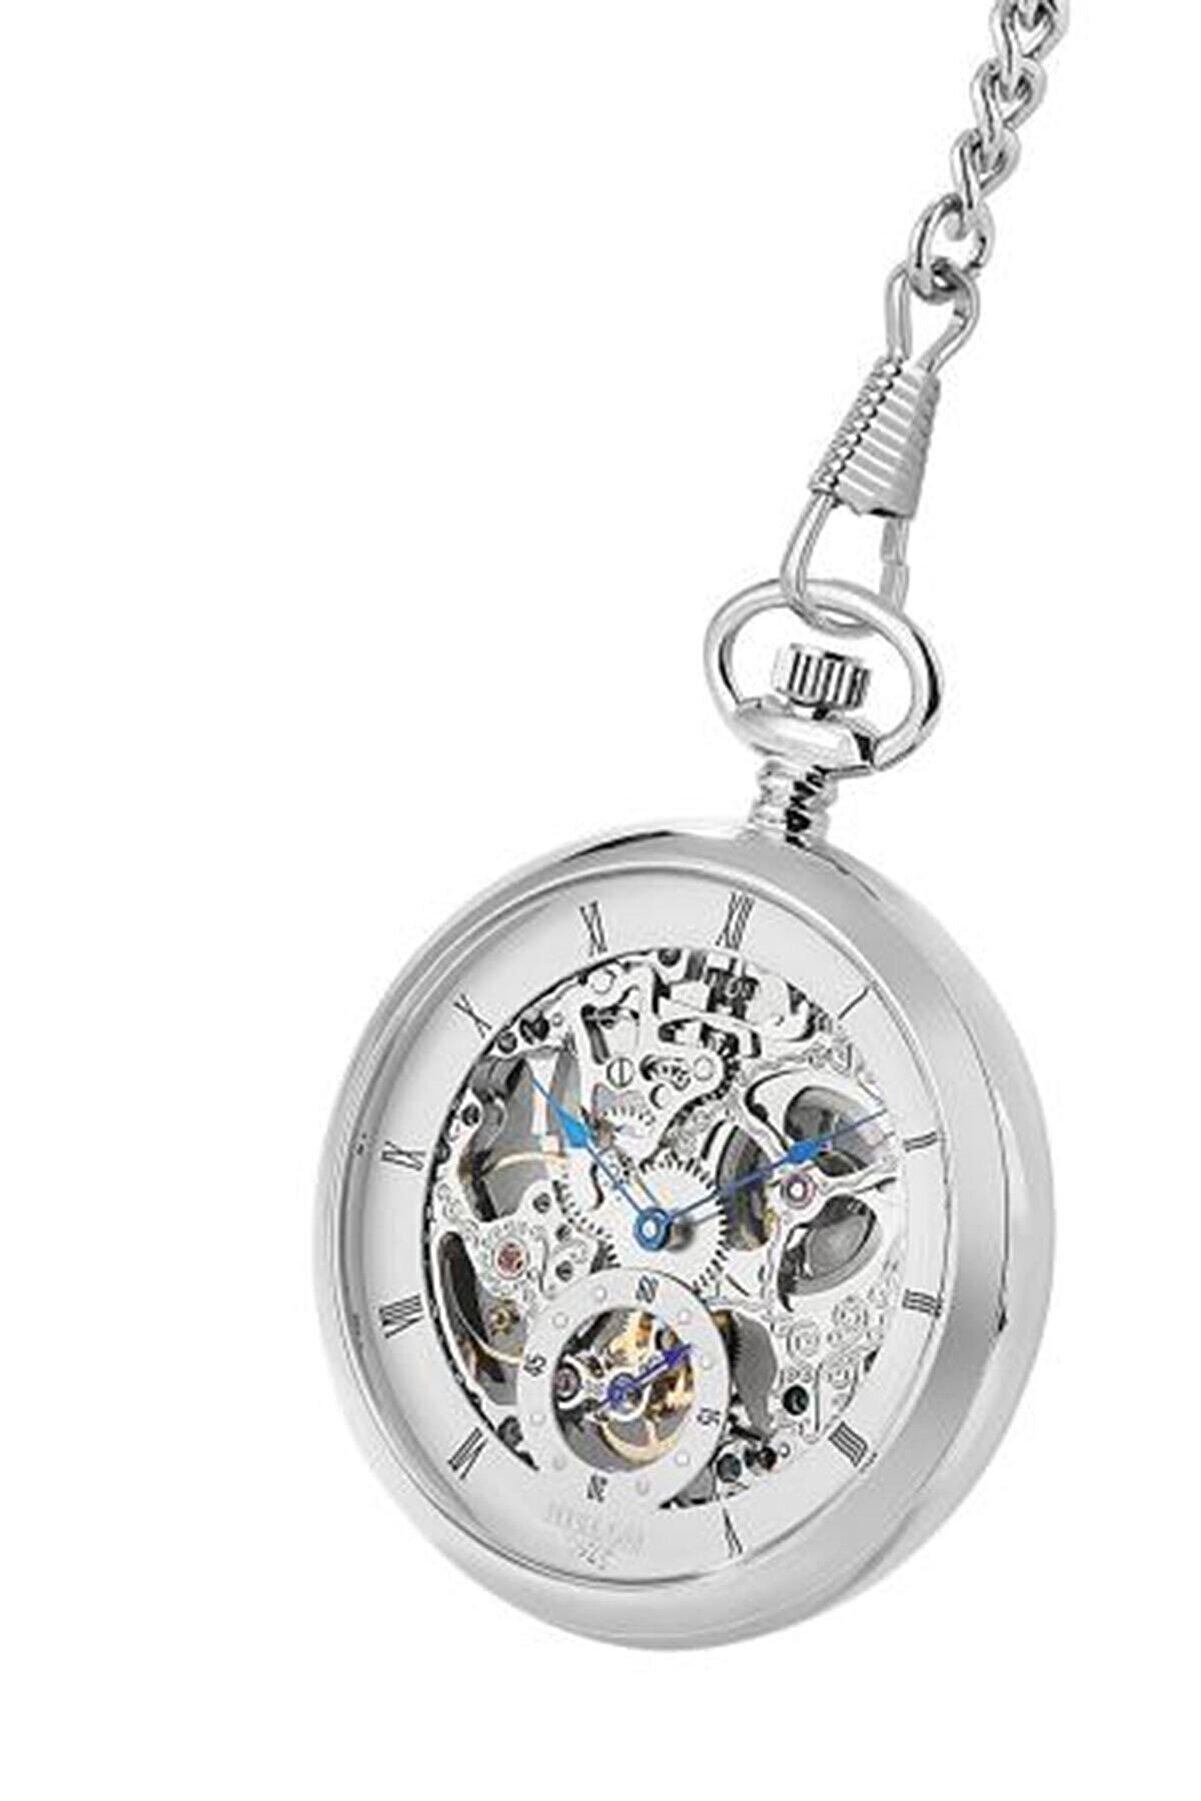 Hislon 9089-12313 Kurmalı Cep Saati